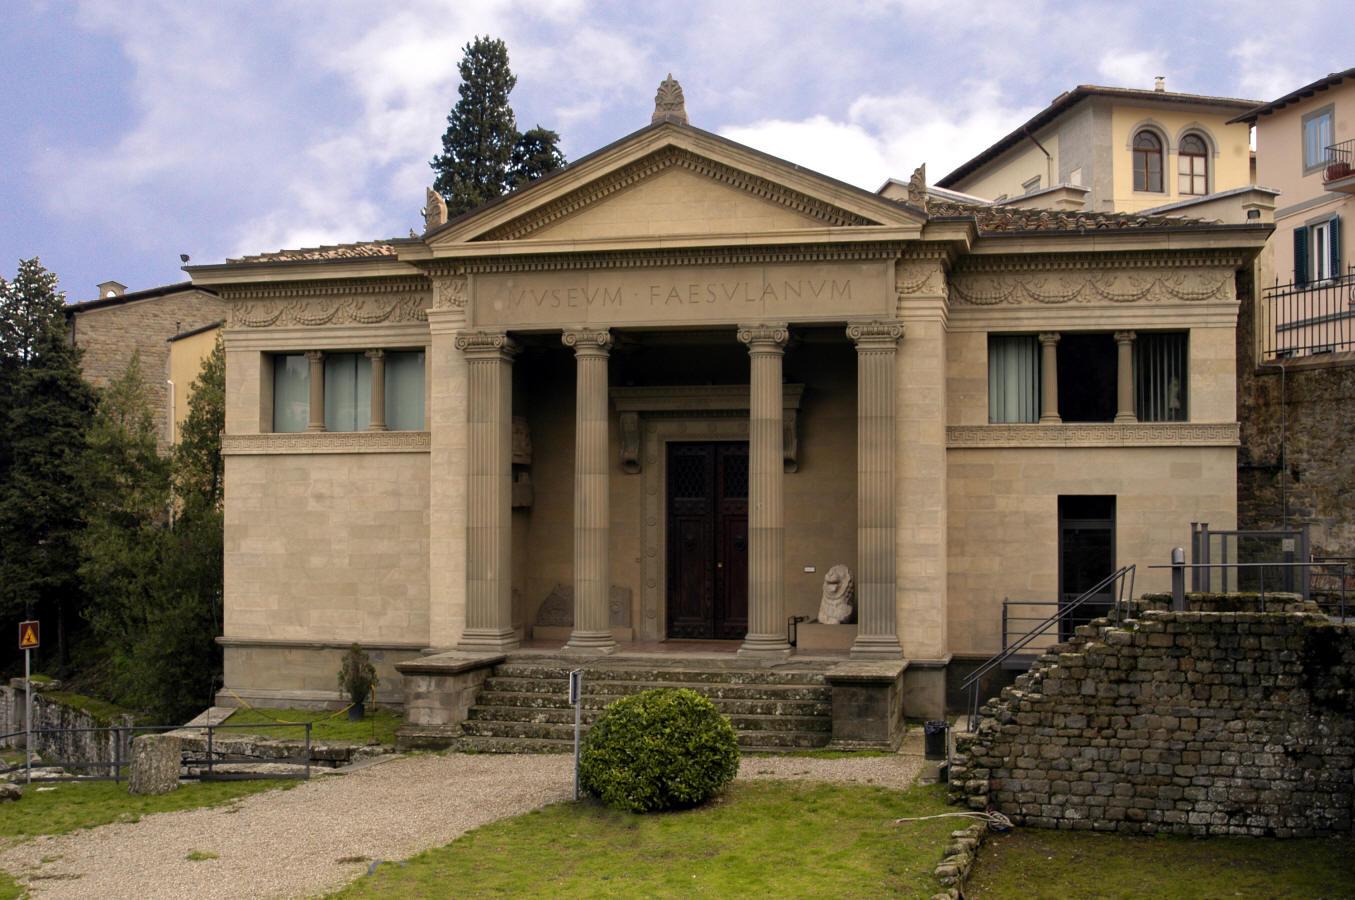 museo fiesole archeology children